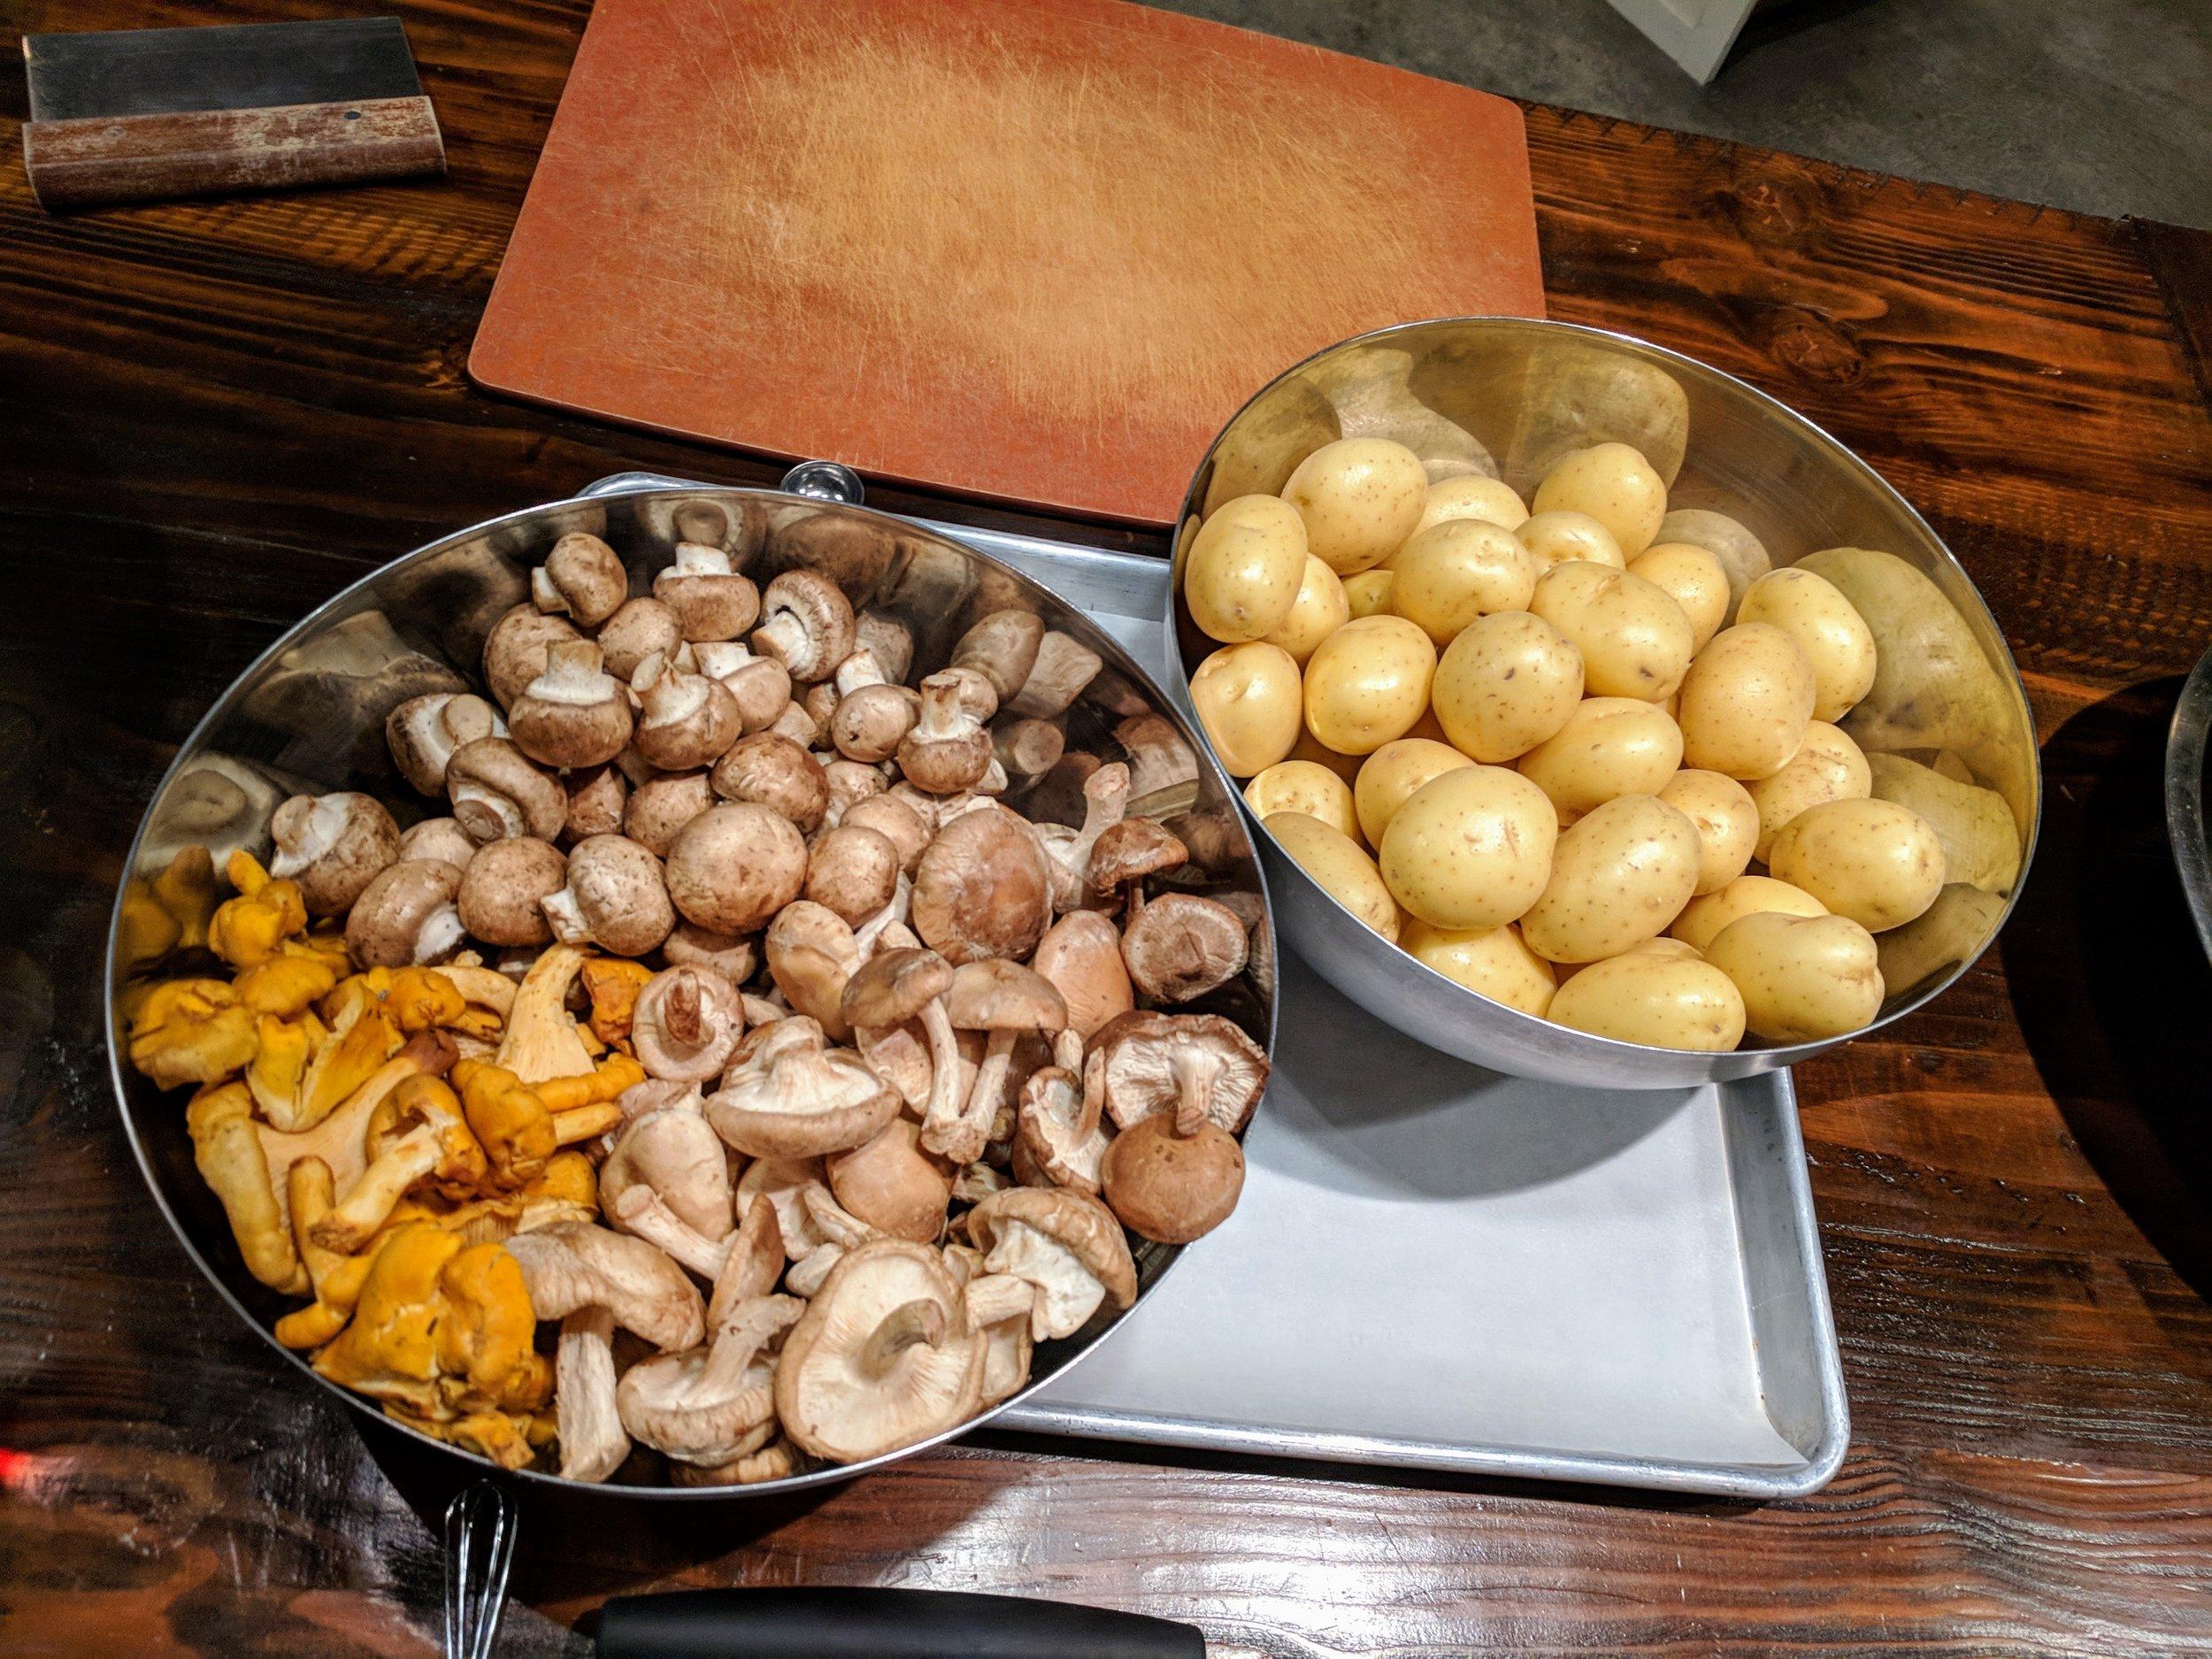 mushrooms-and-potatoes-kitchenatmiddleground.jpg